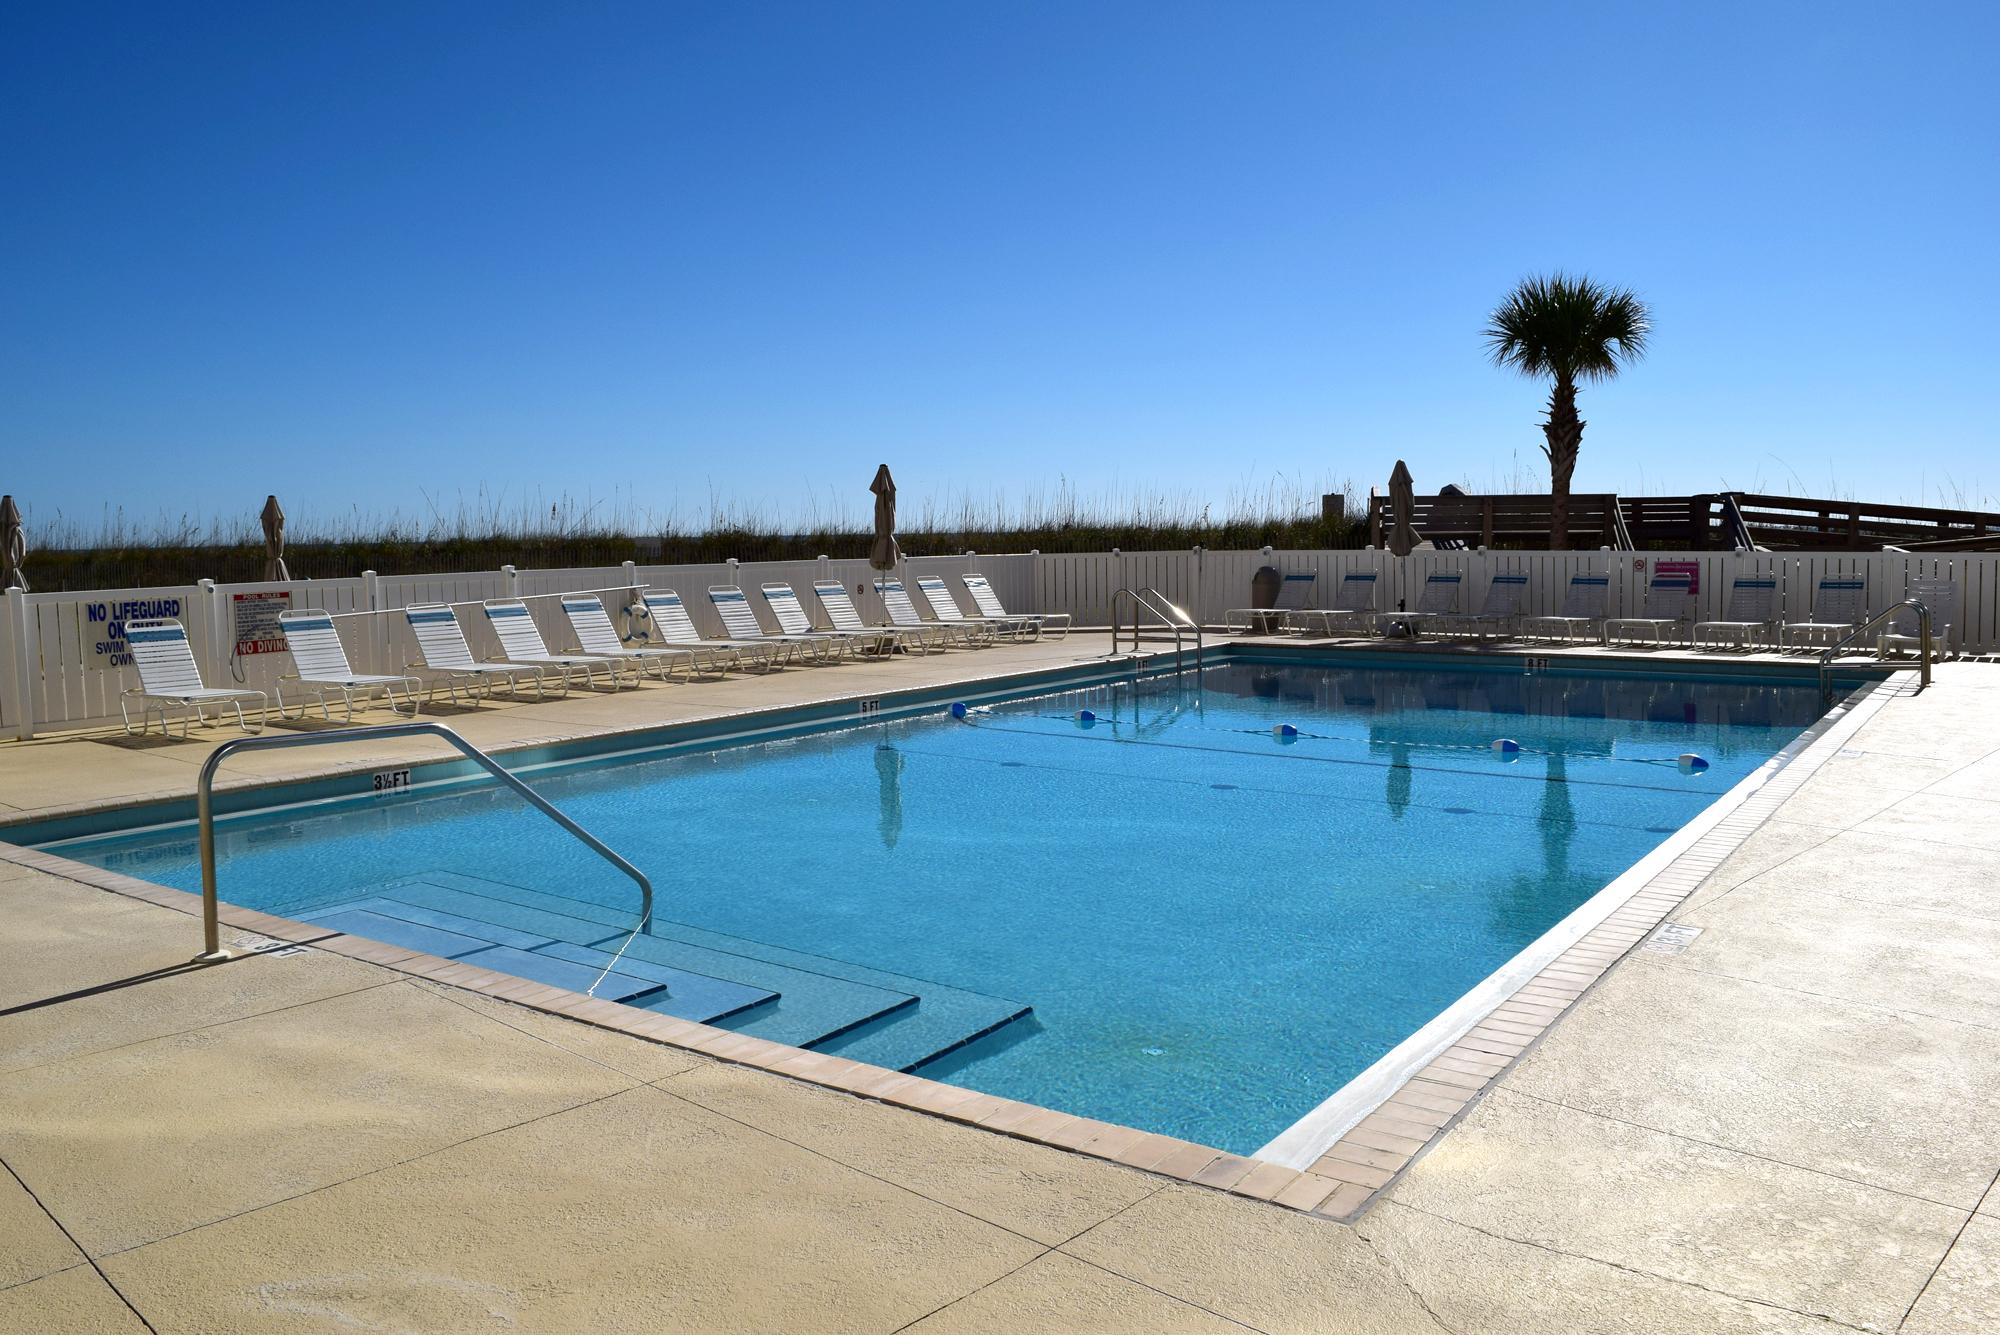 Regency Towers #505E - Fantasea Condo rental in Regency Towers Pensacola Beach in Pensacola Beach Florida - #29